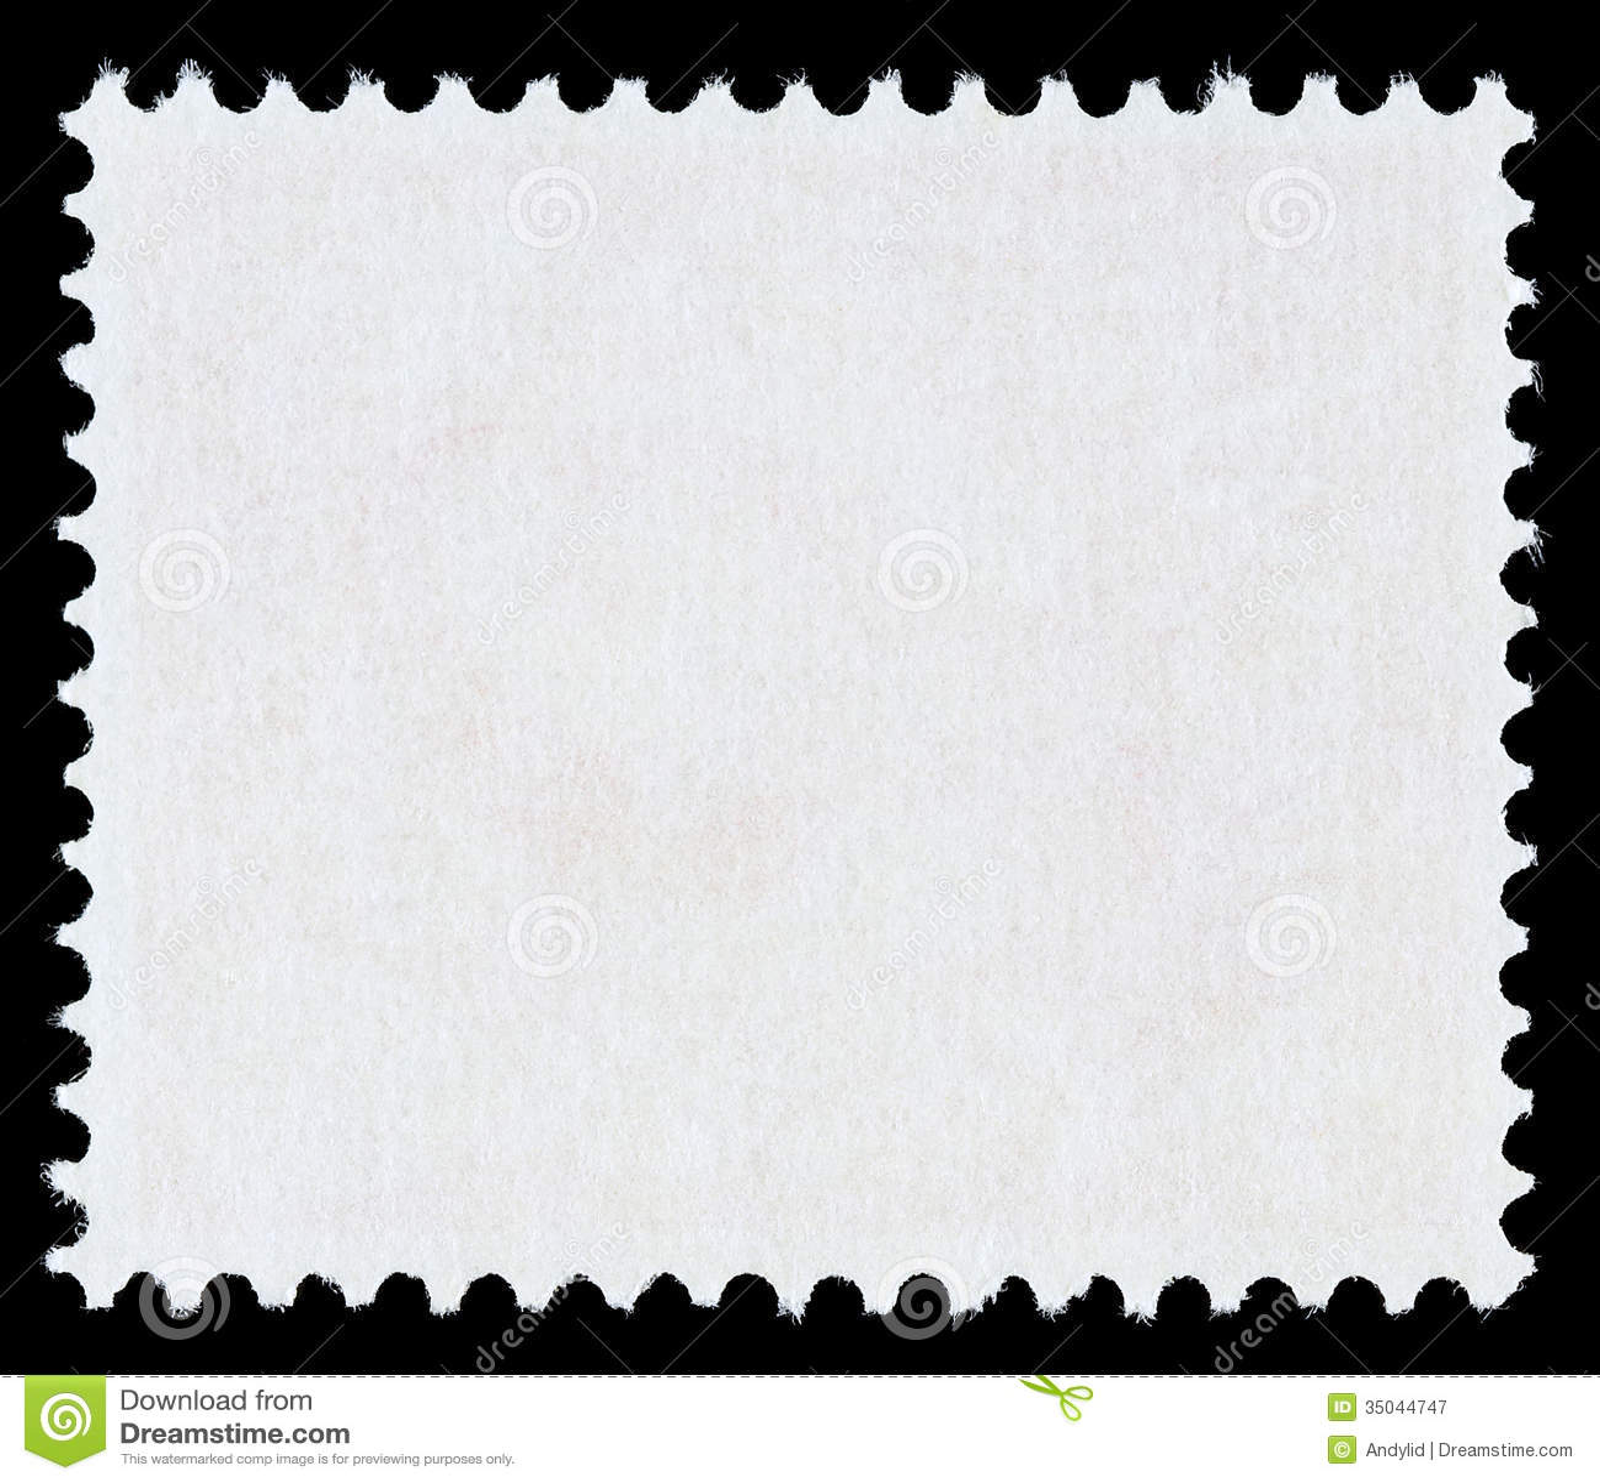 20 free download stamp mockup download free mockup stamp